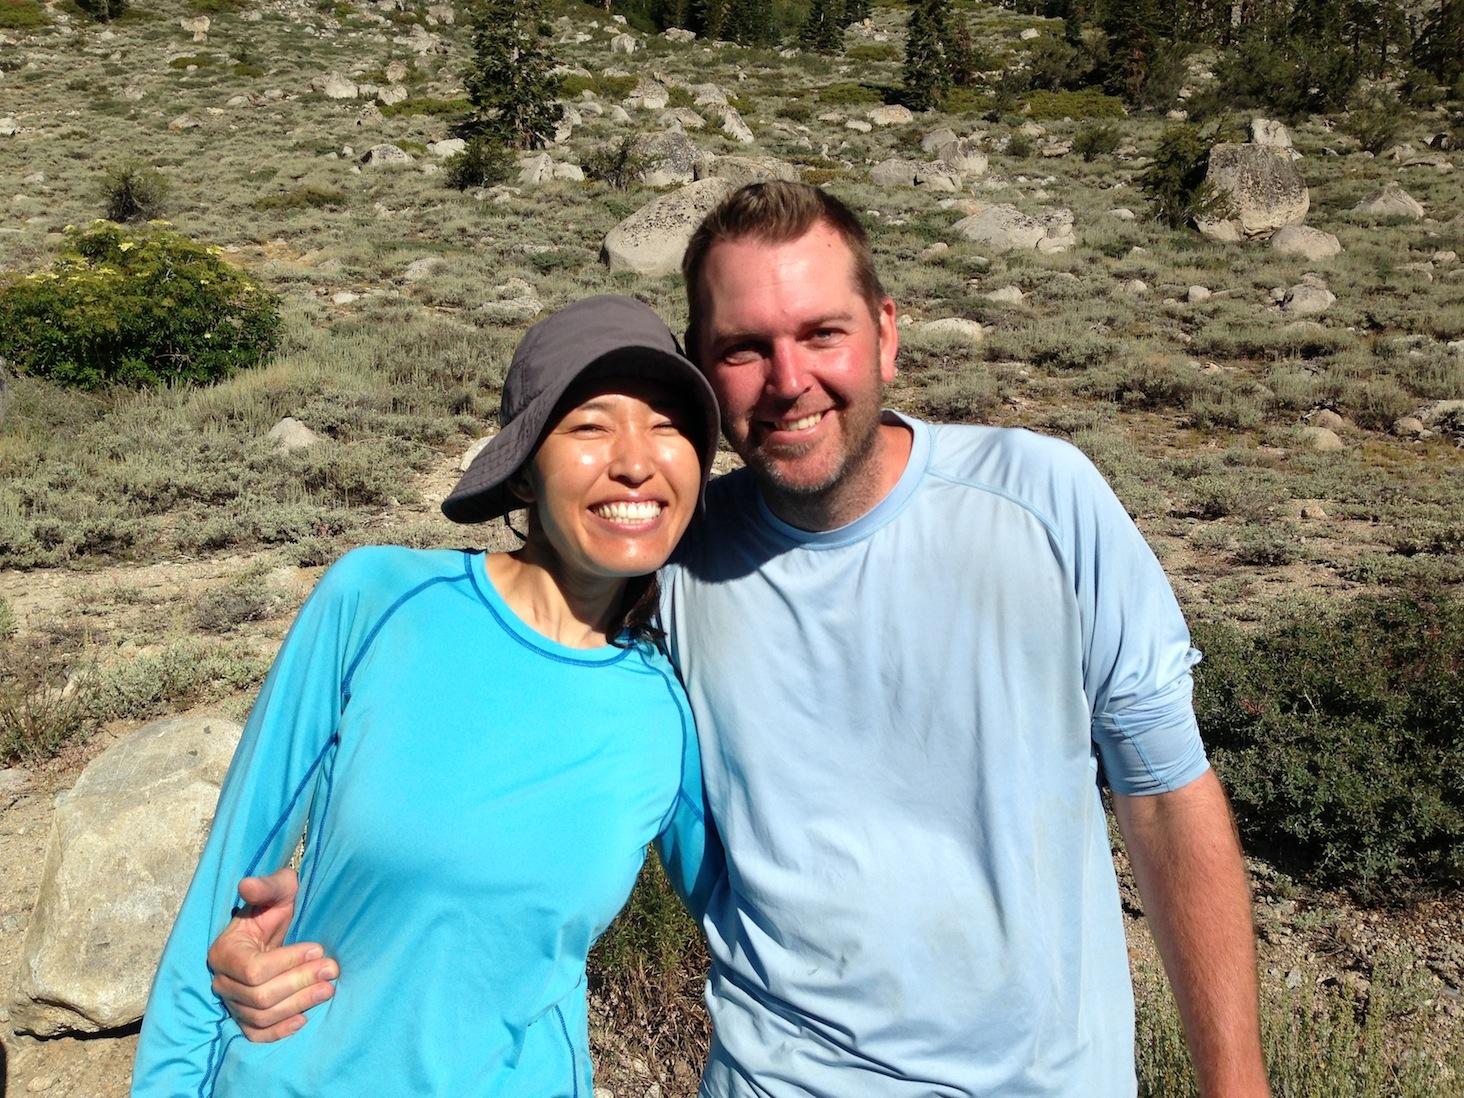 JMT hikers Esti and Brad